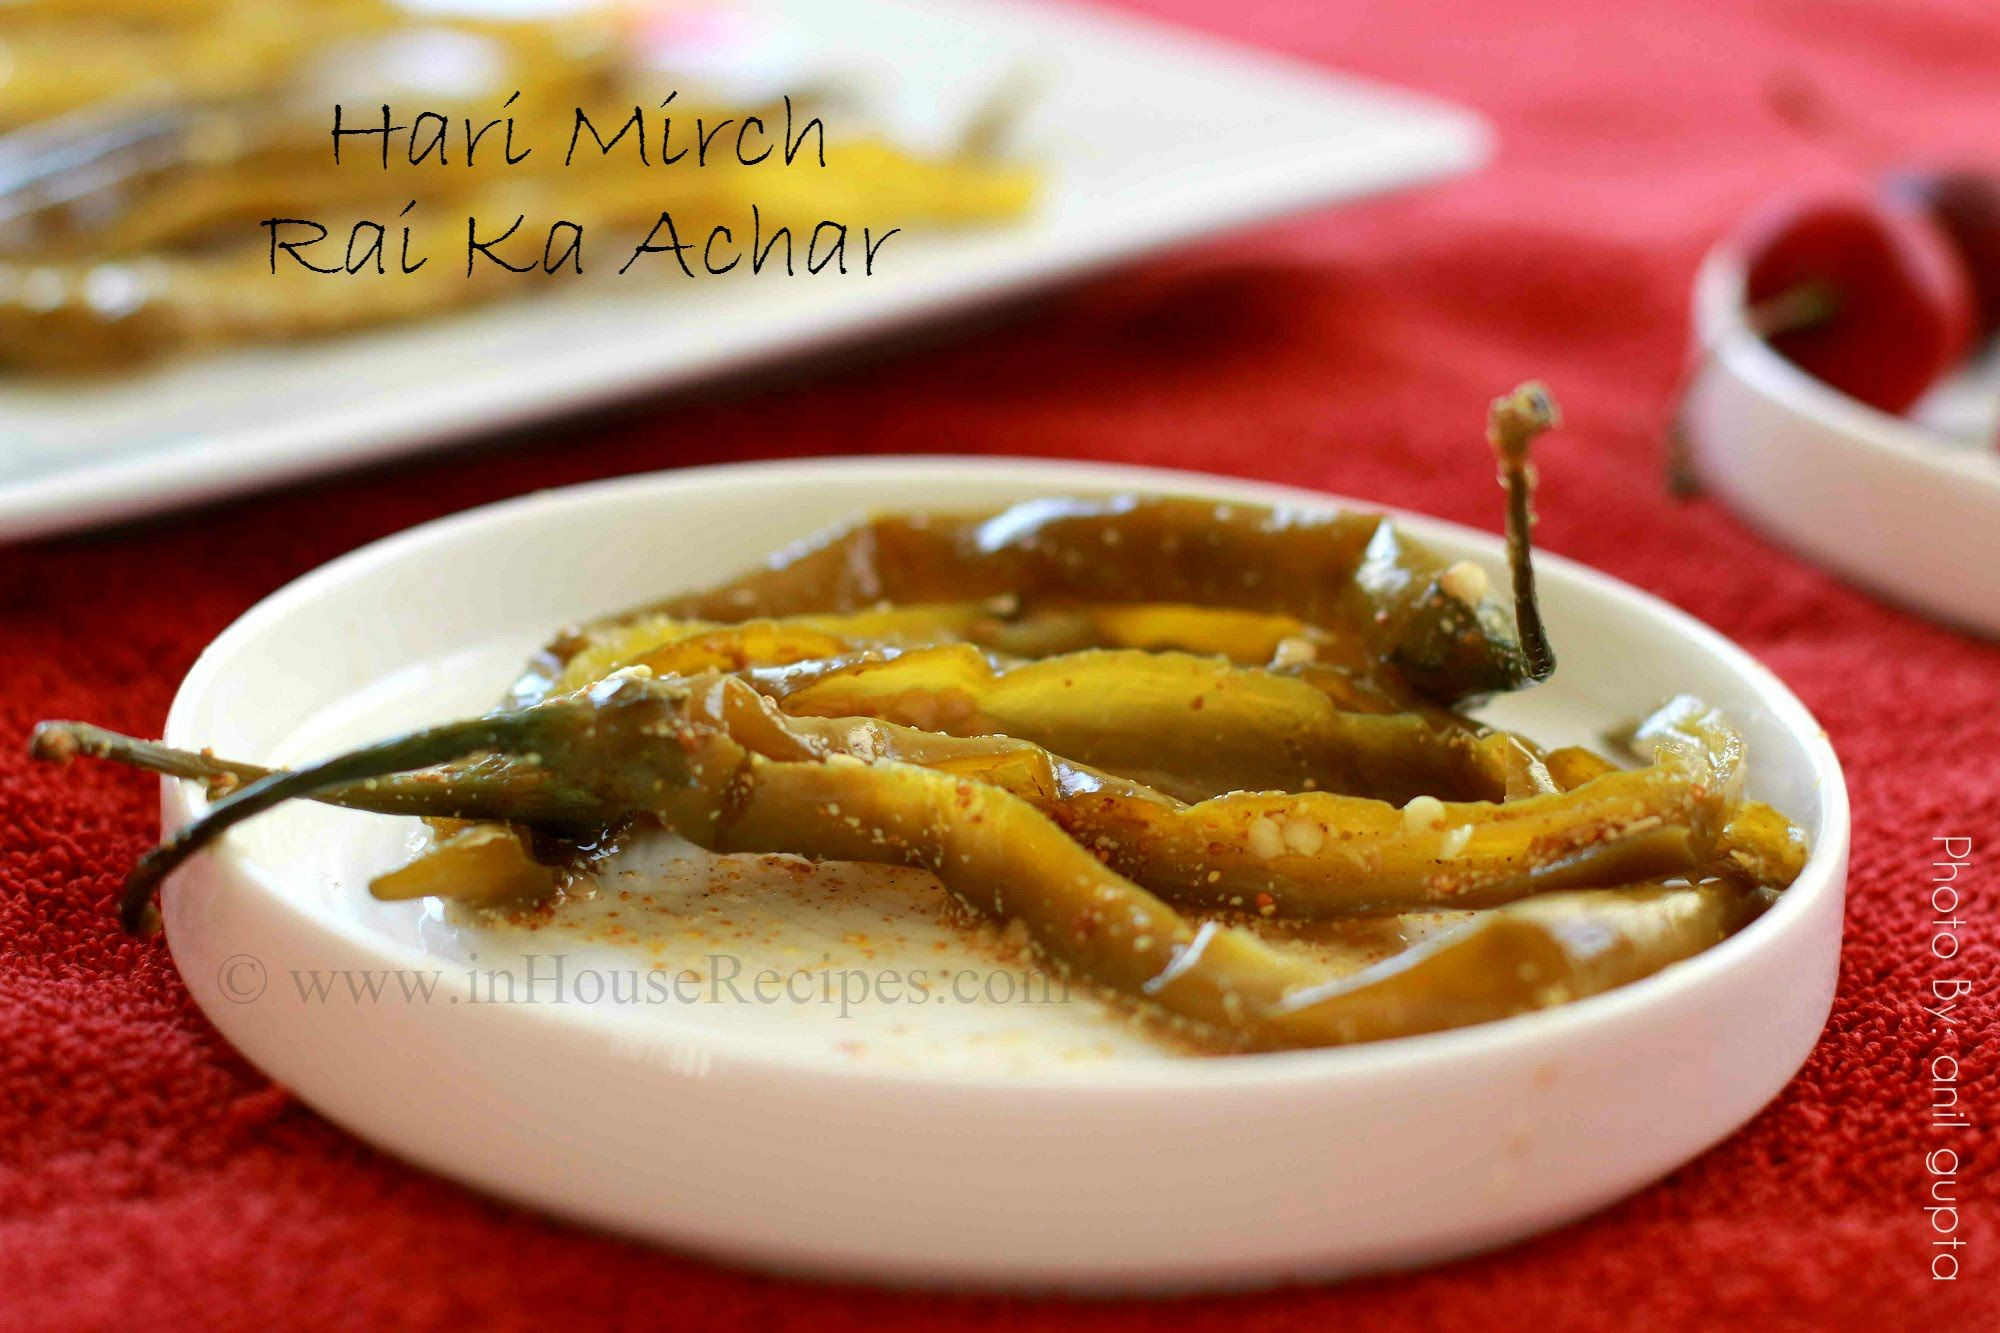 Hari mirch rai achar recipe video in hindi pickles chutneys hari mirch rai achar recipe video in hindi forumfinder Gallery